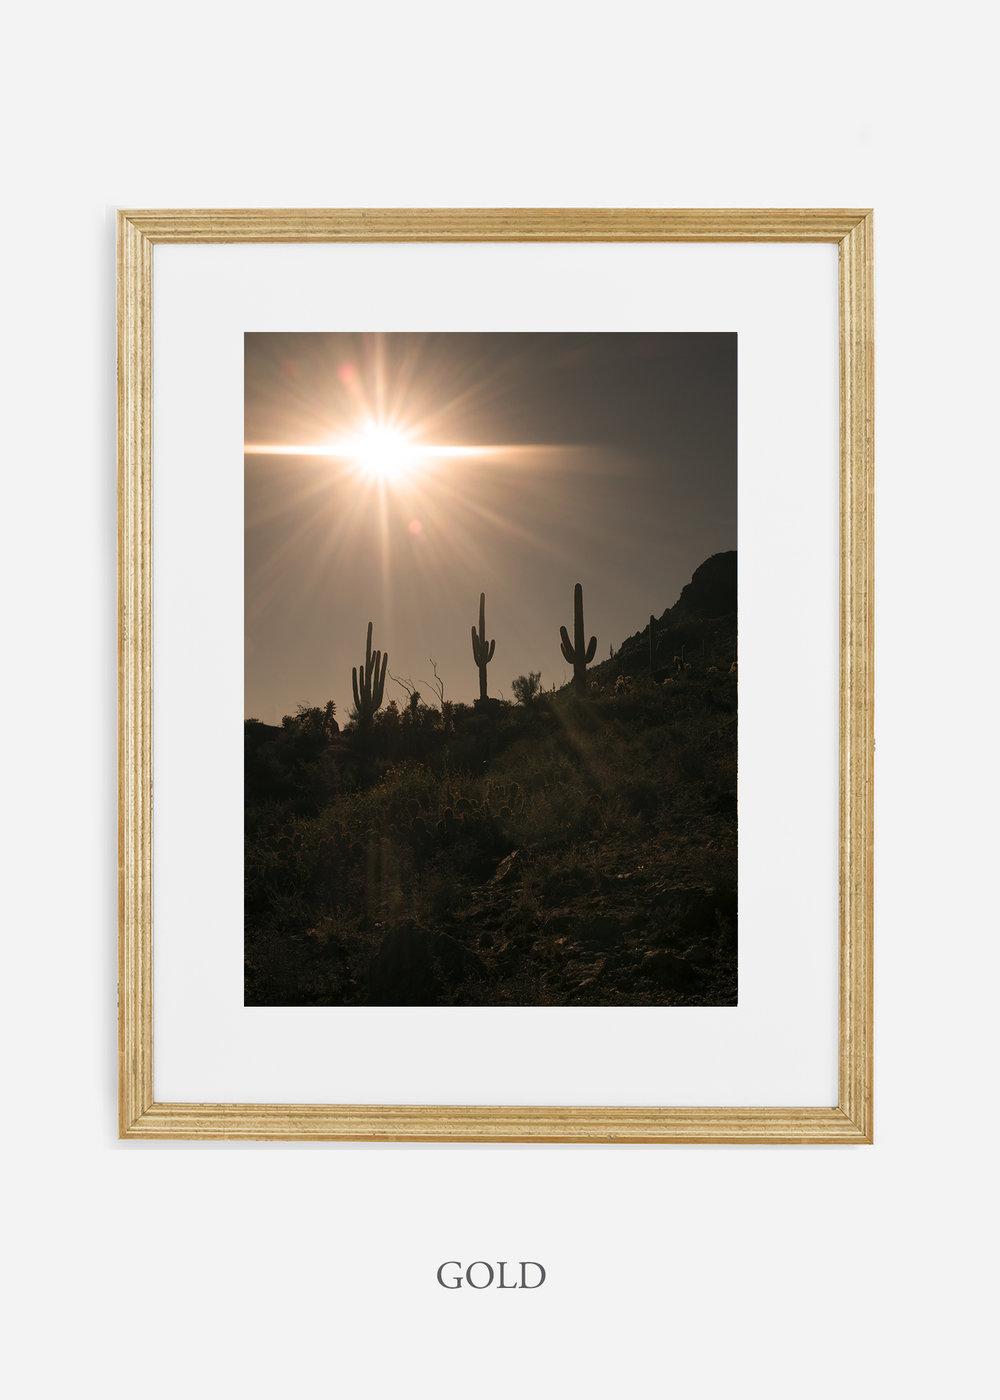 goldframe-saguaroNo.16-wildercalifornia-art-wallart-cactusprint-homedecor-prints-arizona-botanical-artwork-interiordesign.jpg